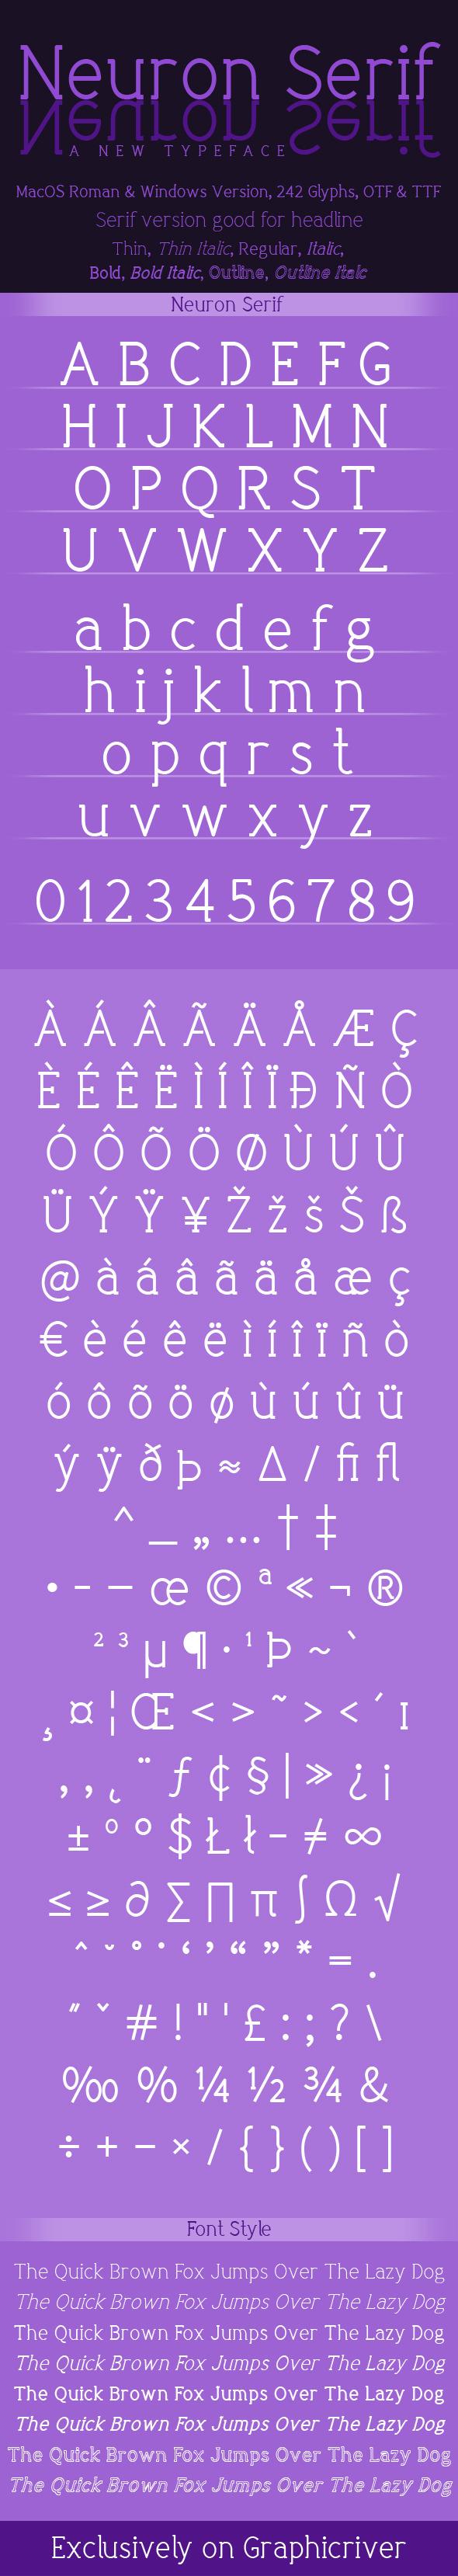 Neuron Serif Family - Serif Fonts